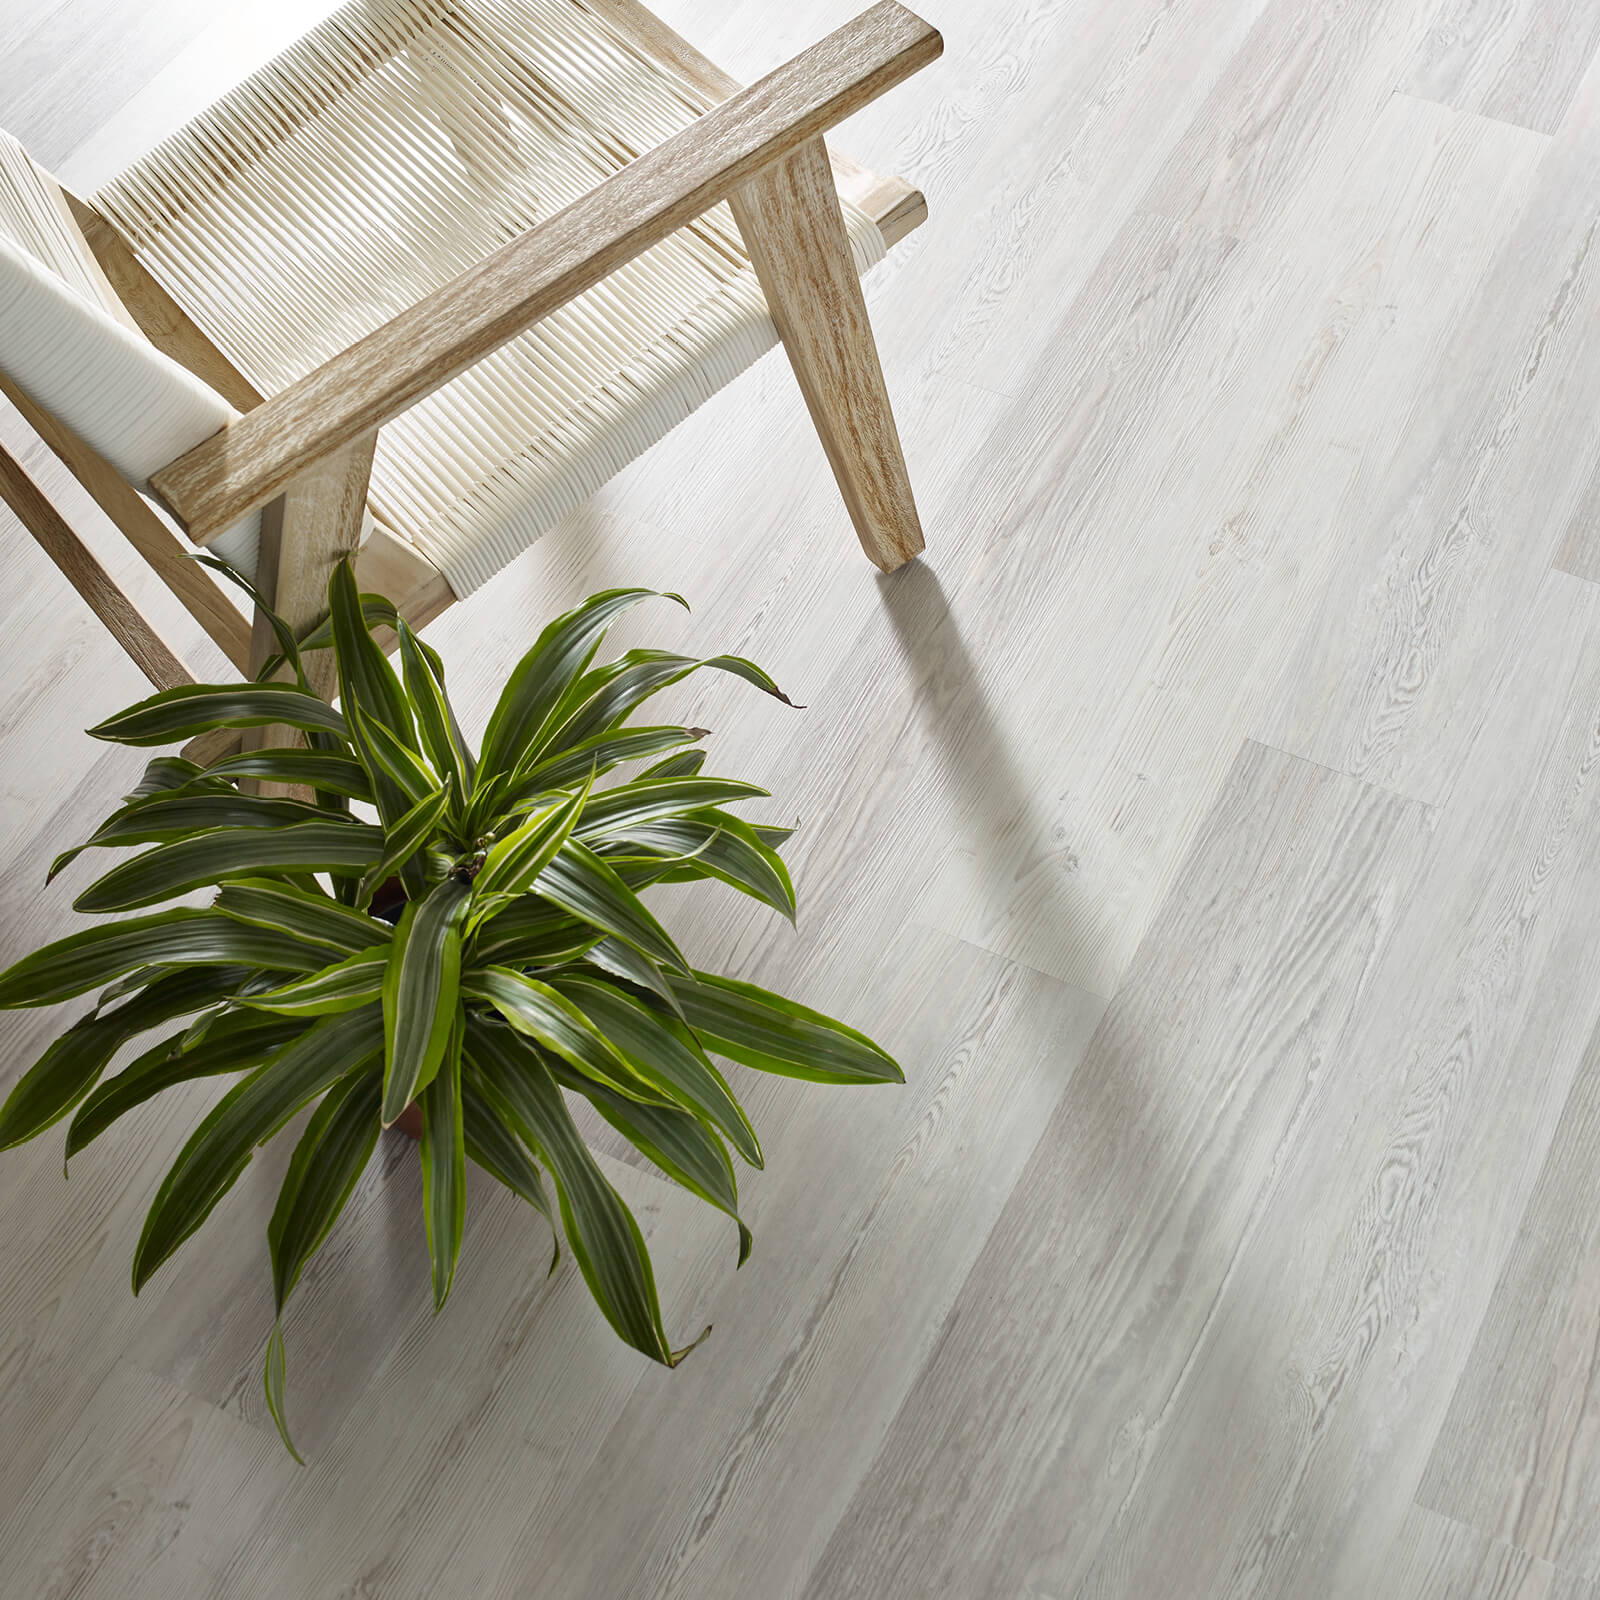 Vinyl flooring | The Carpet Factory Super Store